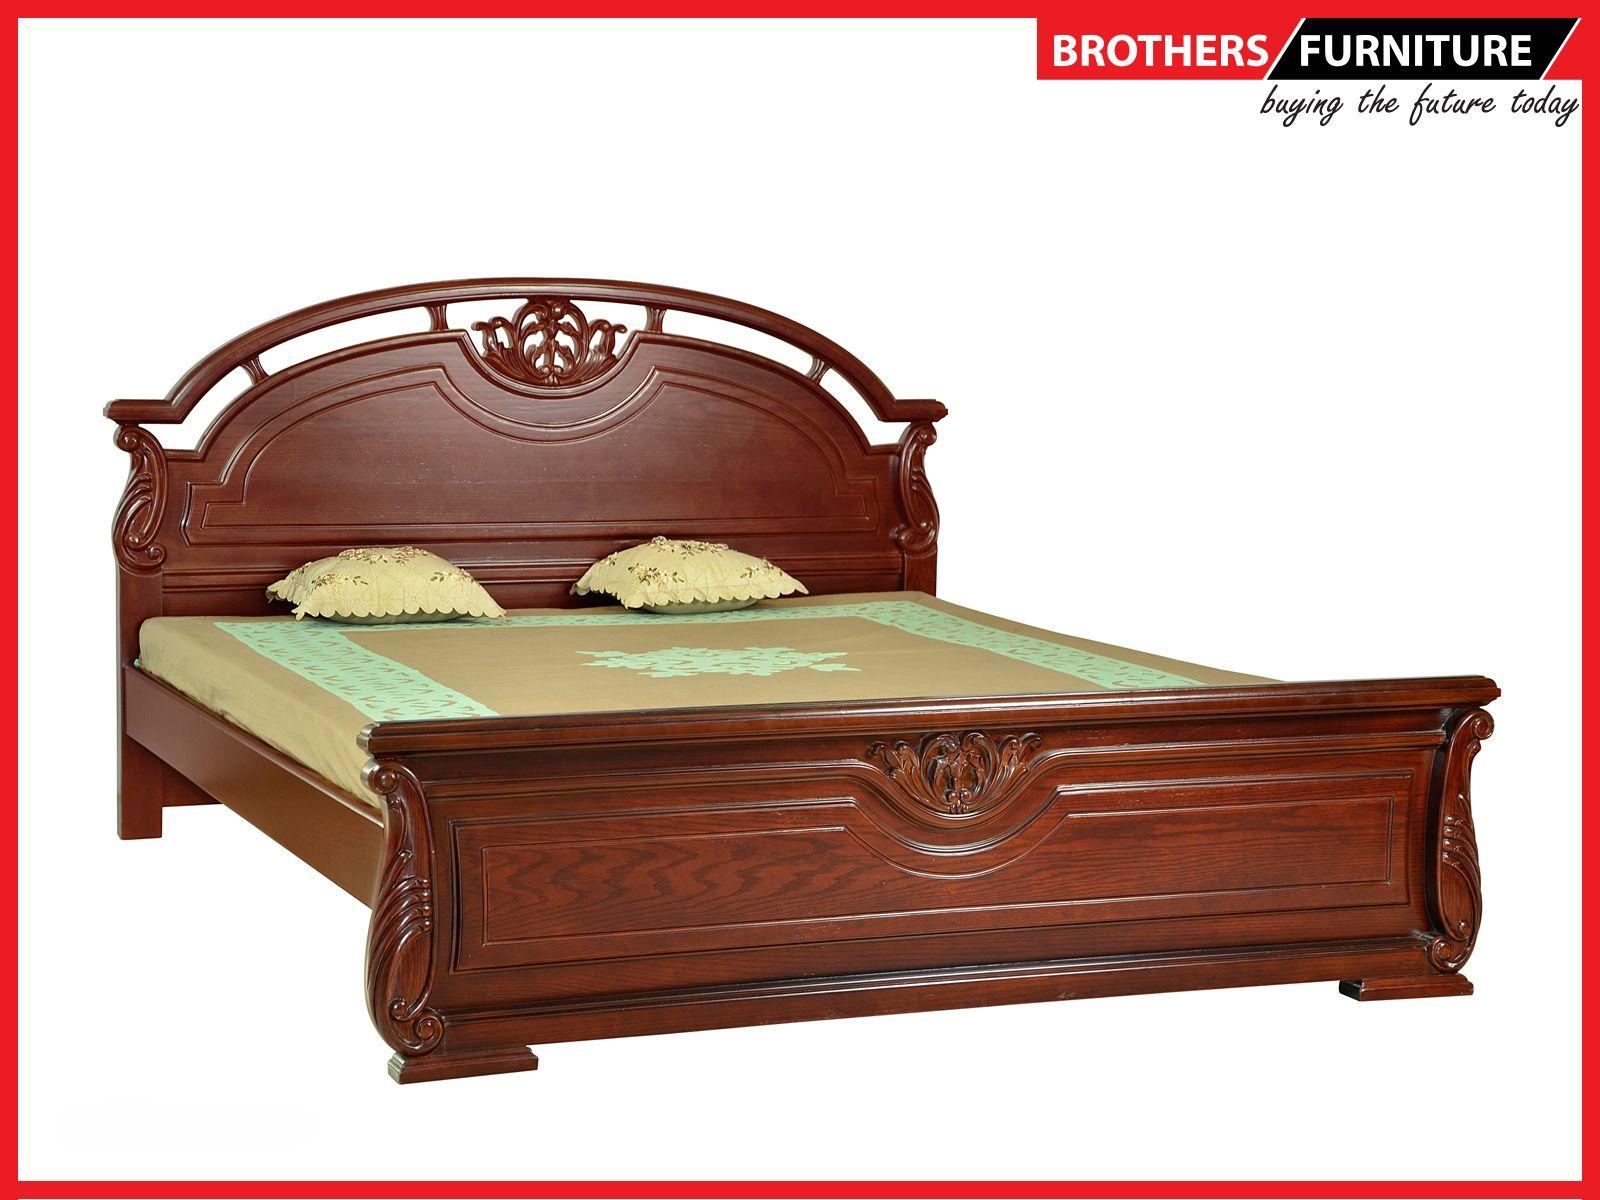 bd furniture - google অনুসন্ধান | furniture